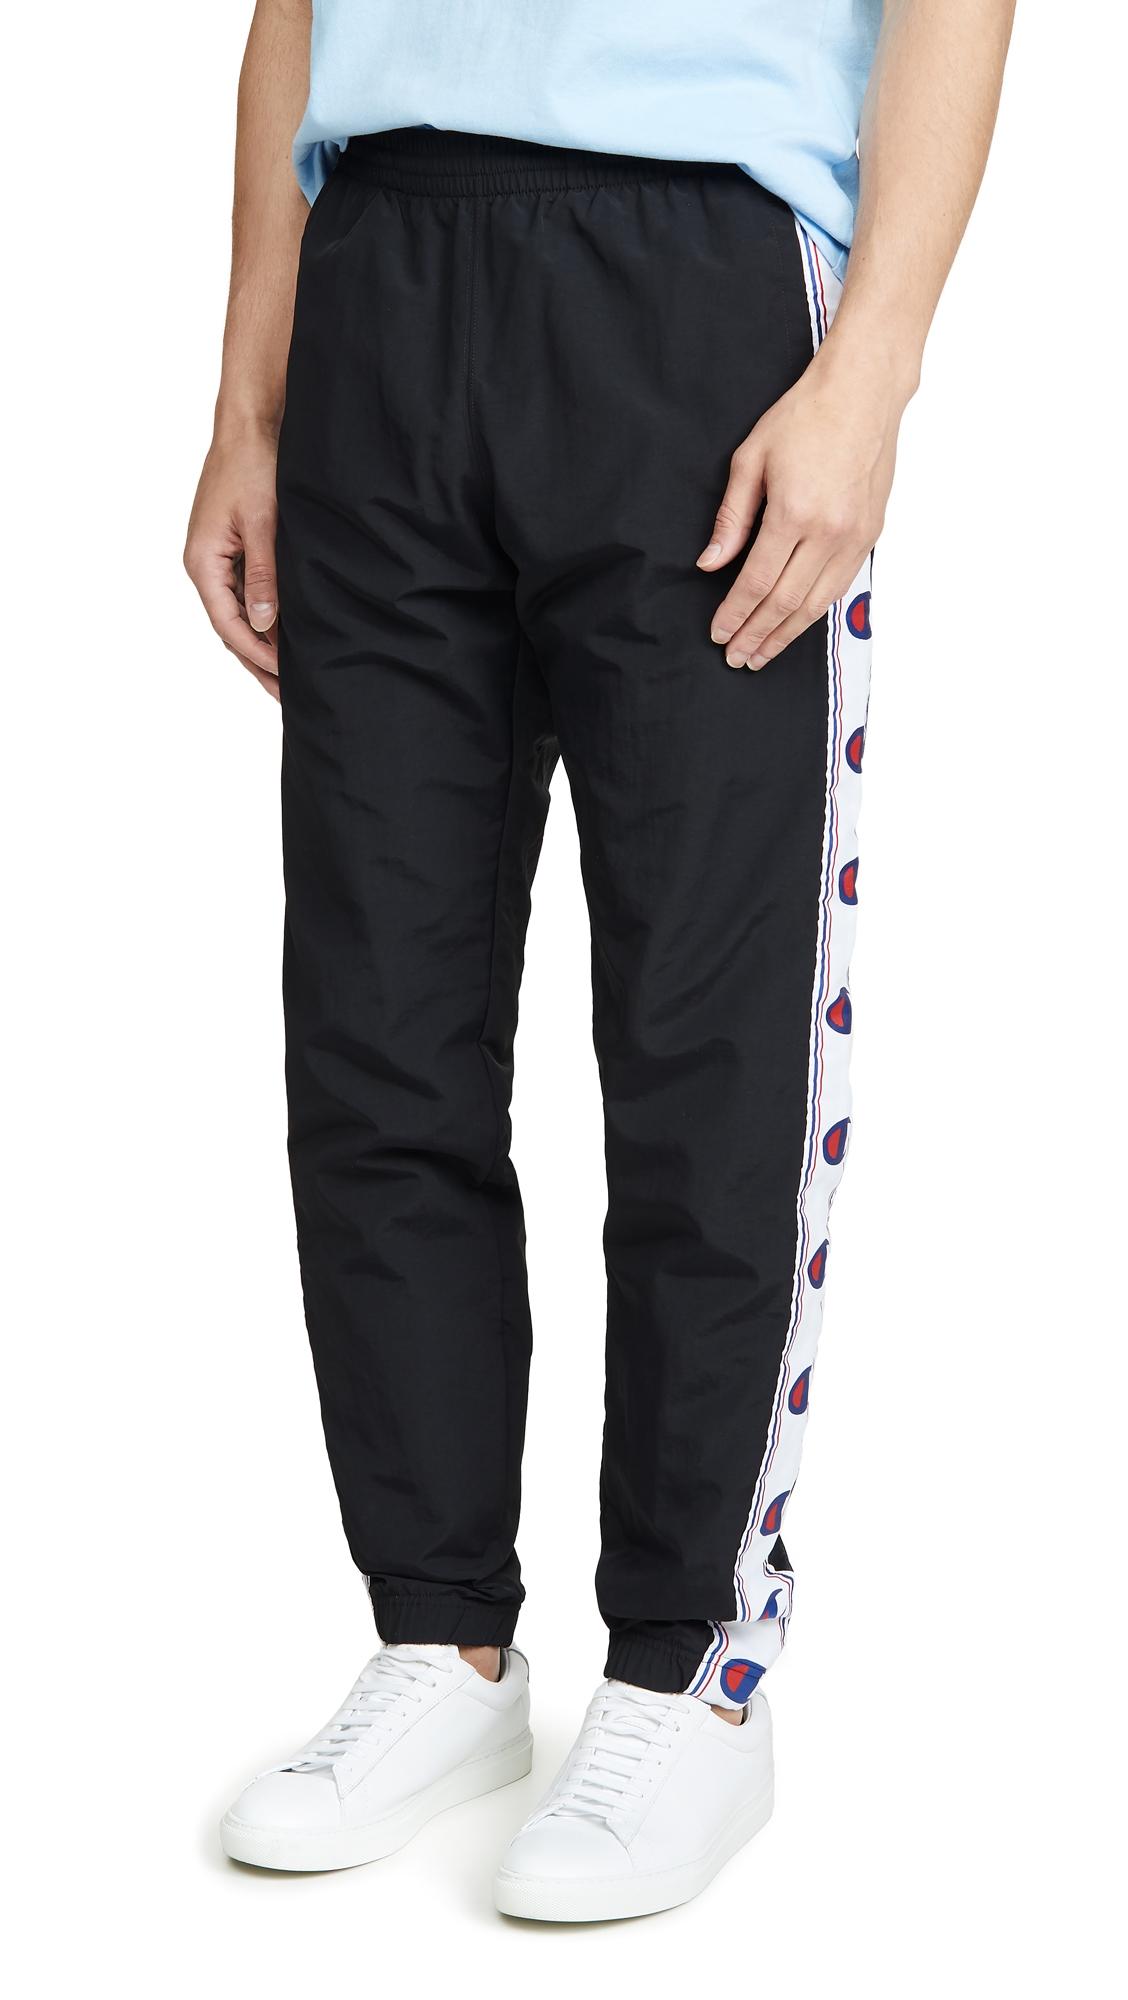 Champion Pants TAPED LOGO TRACK PANTS